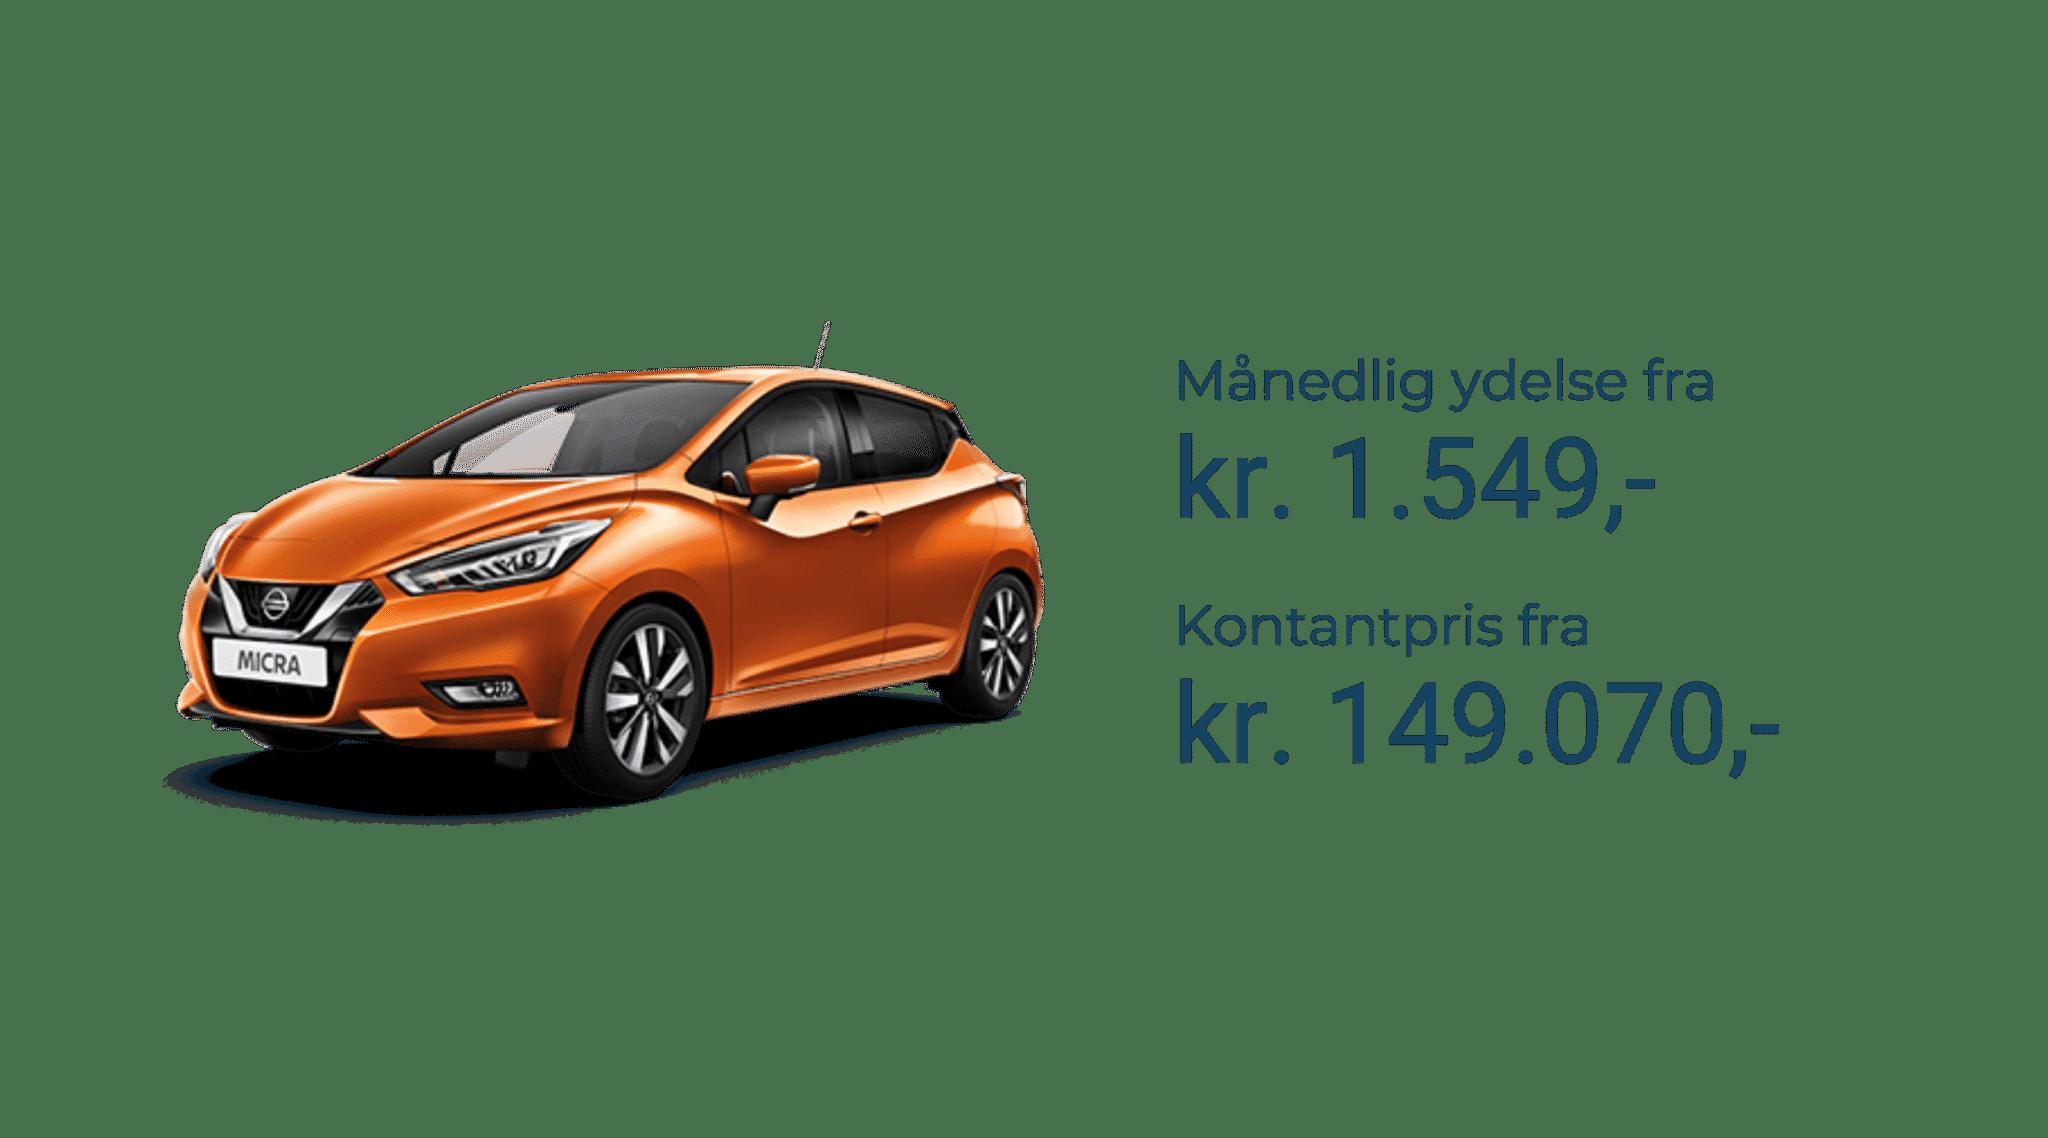 Nissan Micra priser